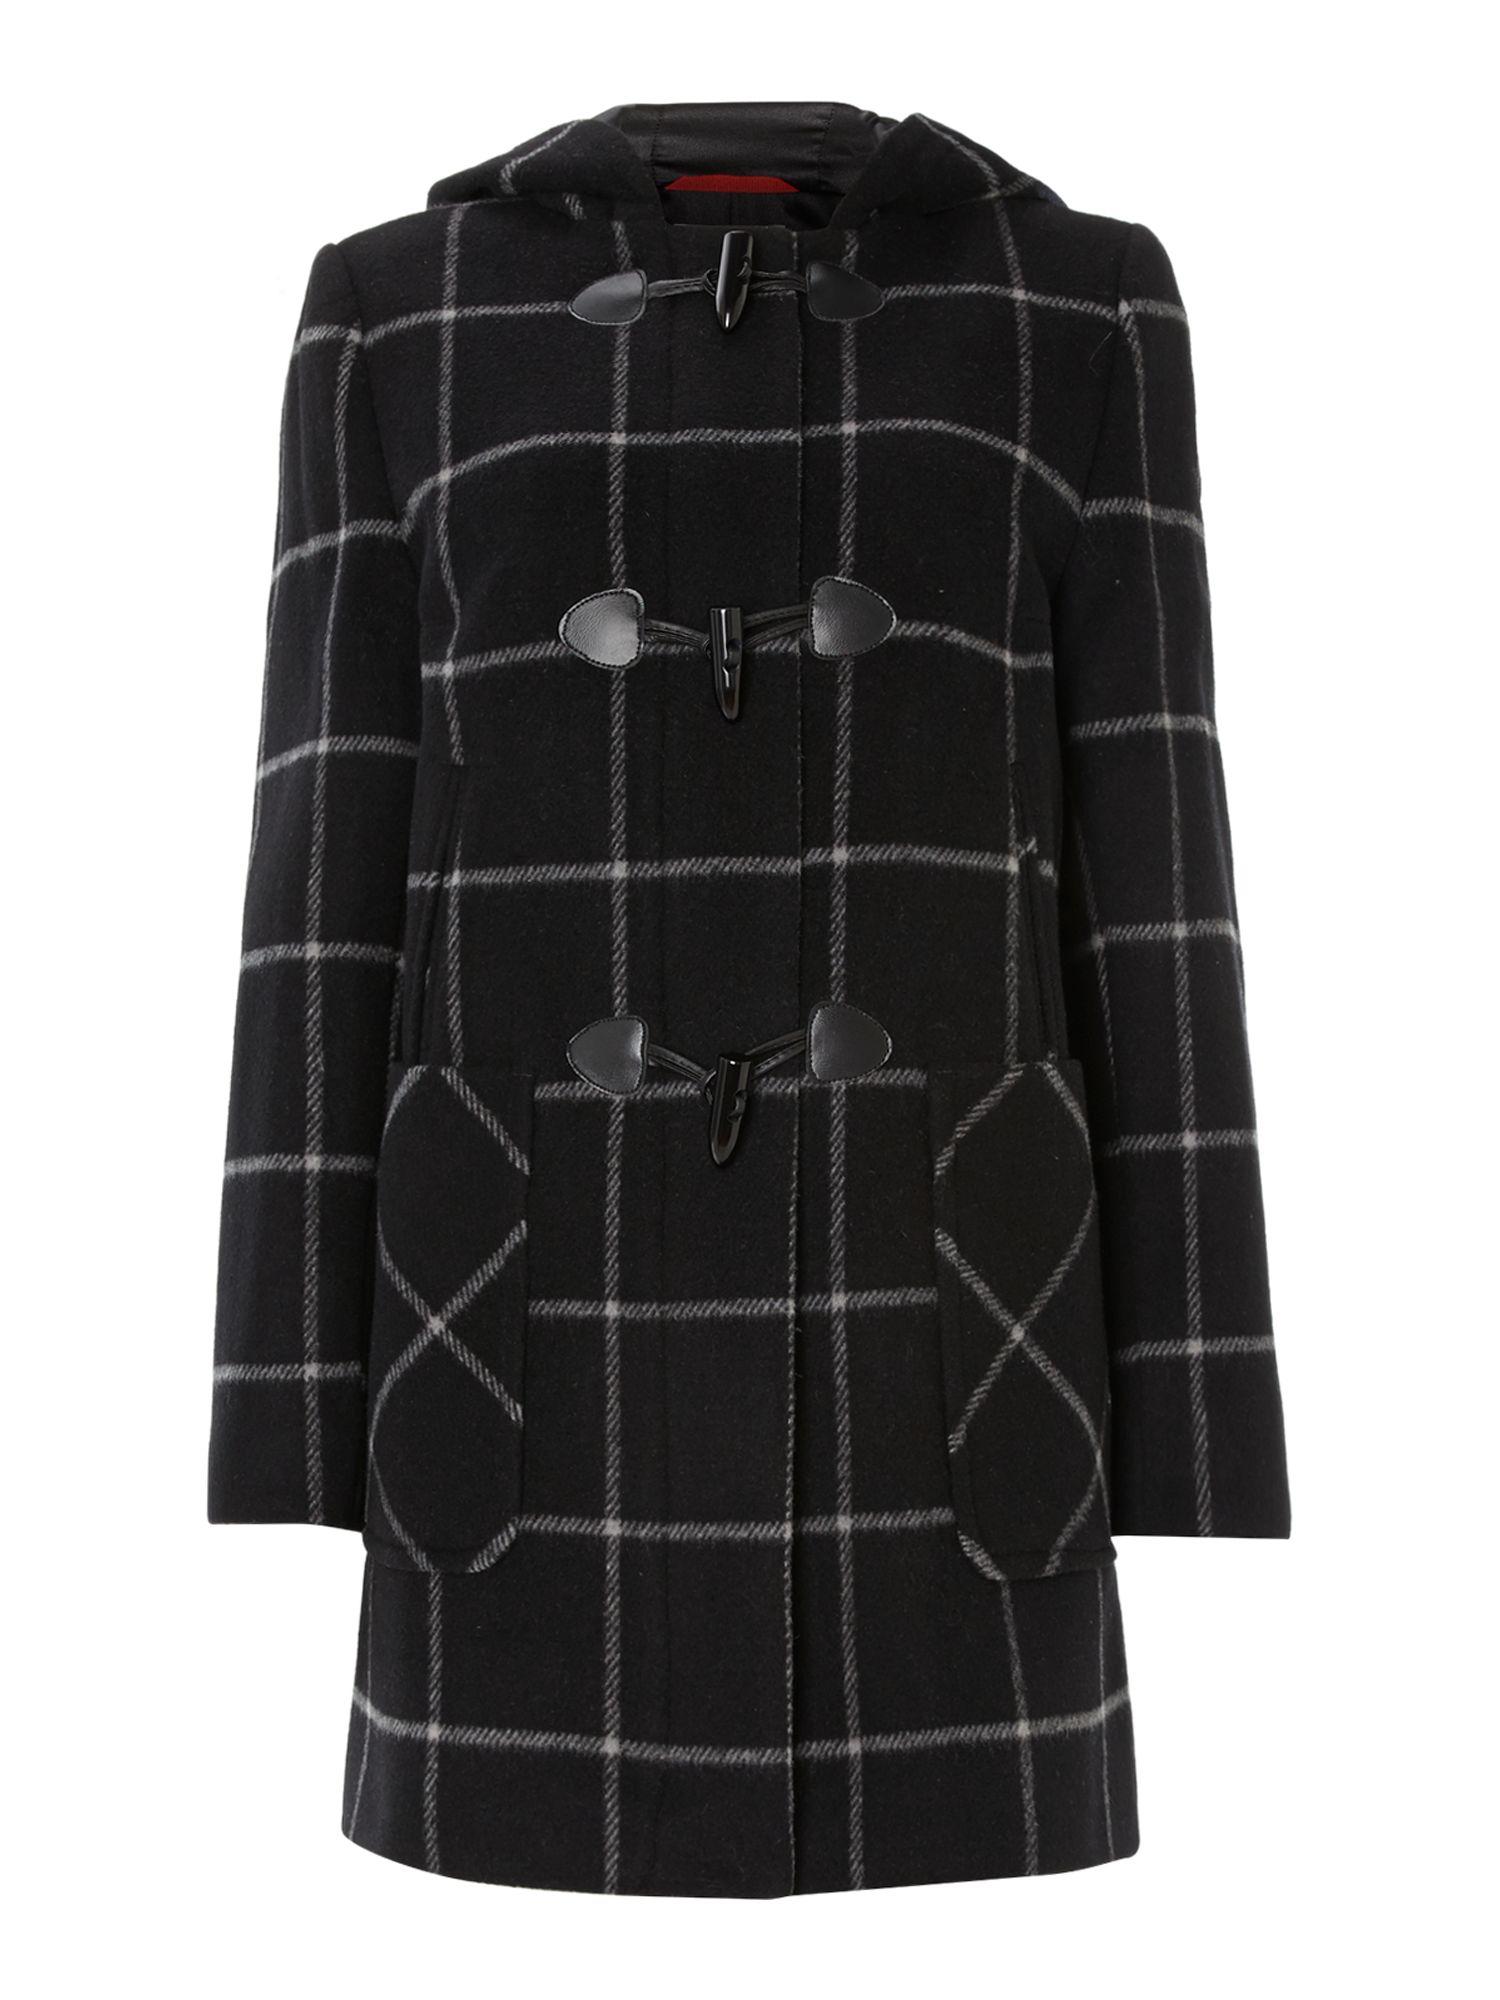 Cloud nine Check Duffle Coat in Black | Lyst